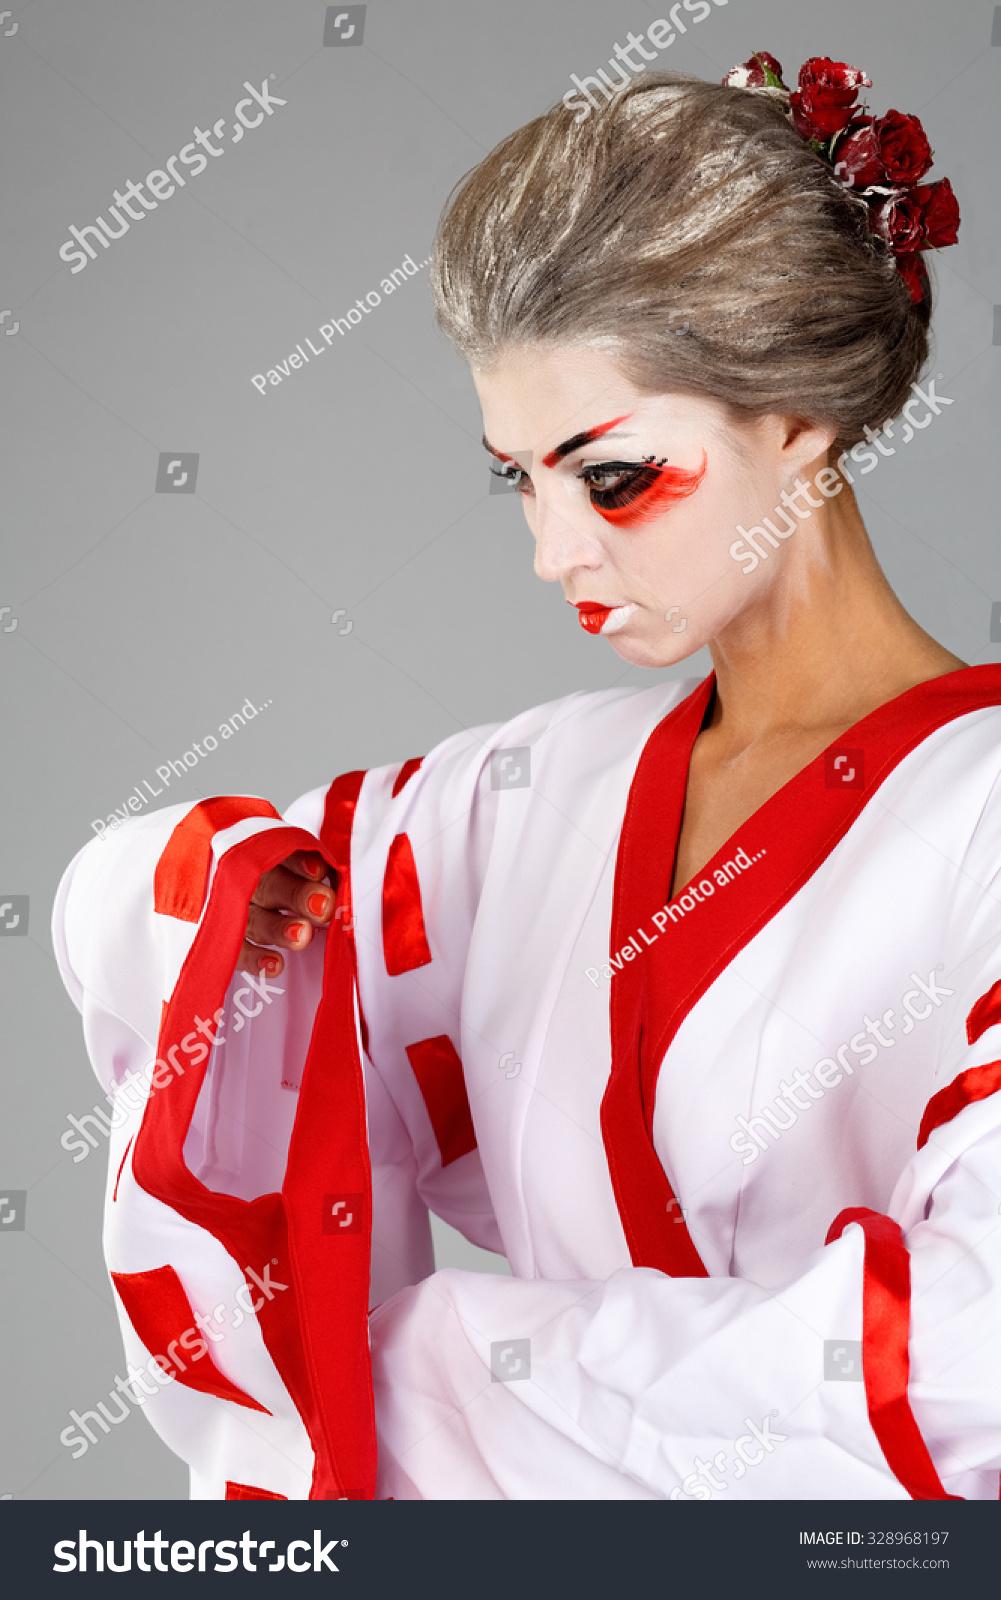 5f19eea359 girl in traditional Japanese costume and makeup looking away studio shot.